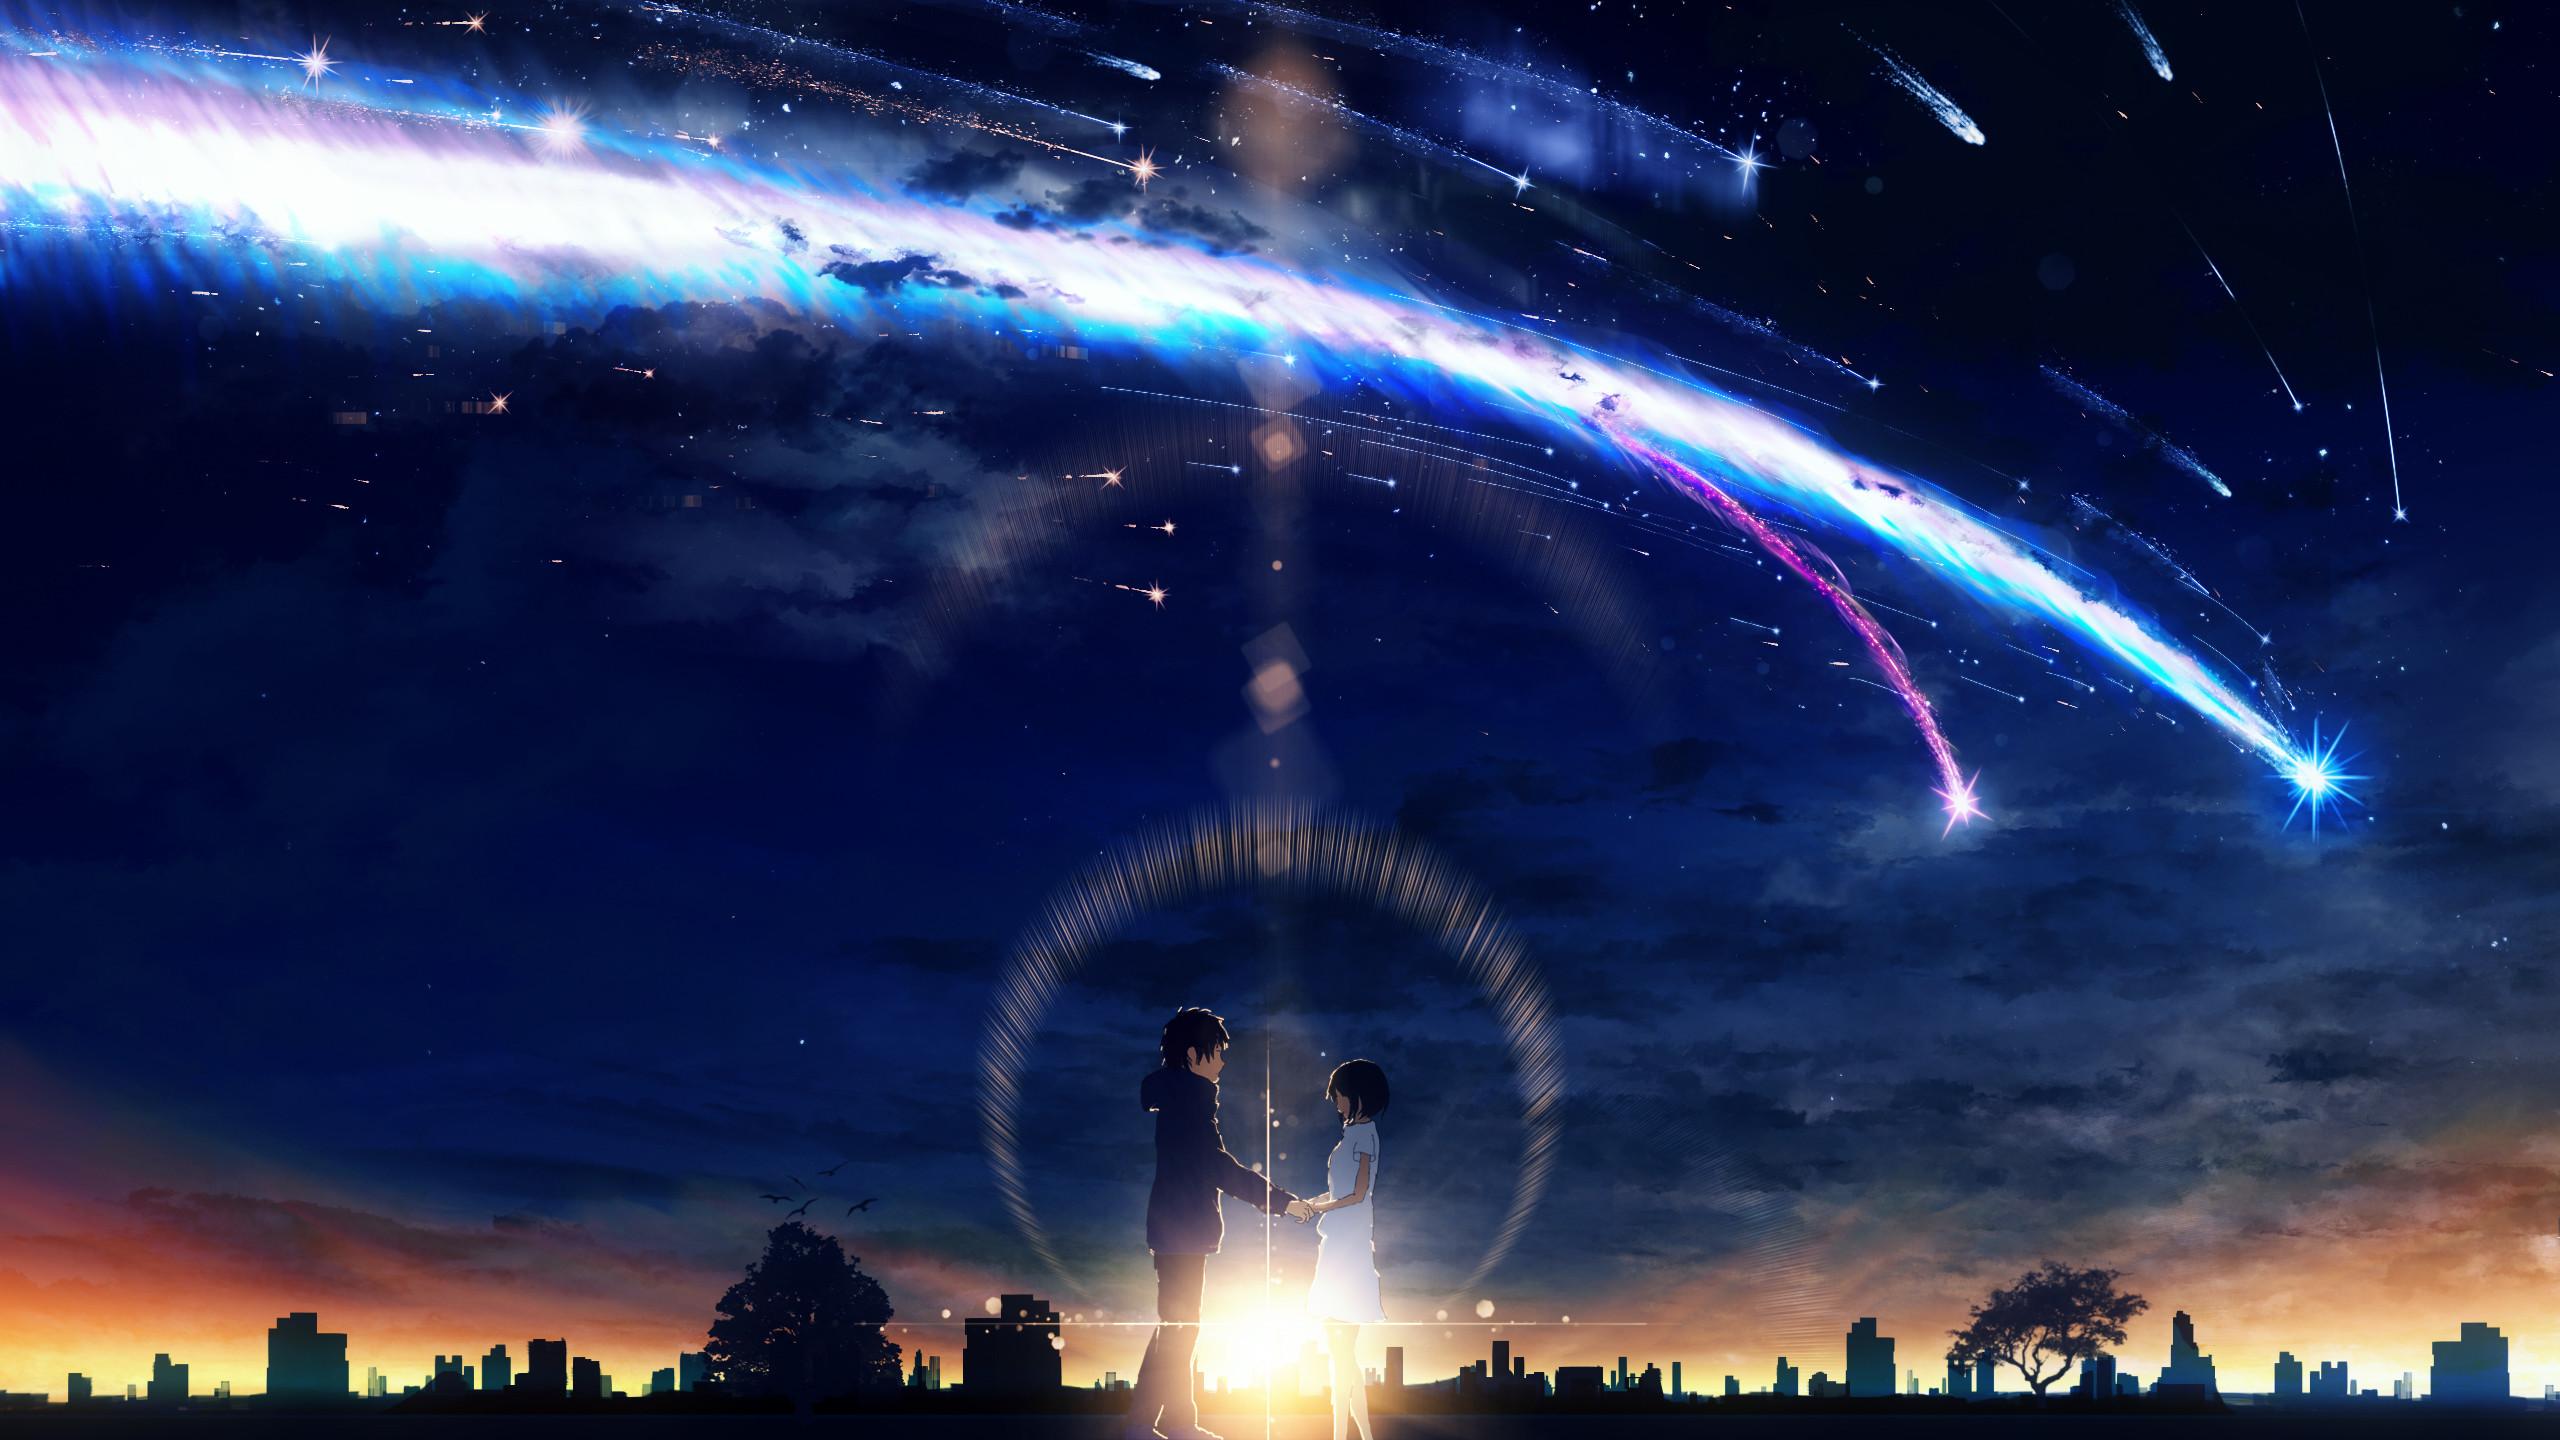 Res: 2560x1440, View Fullsize Kimi no Na wa. Image